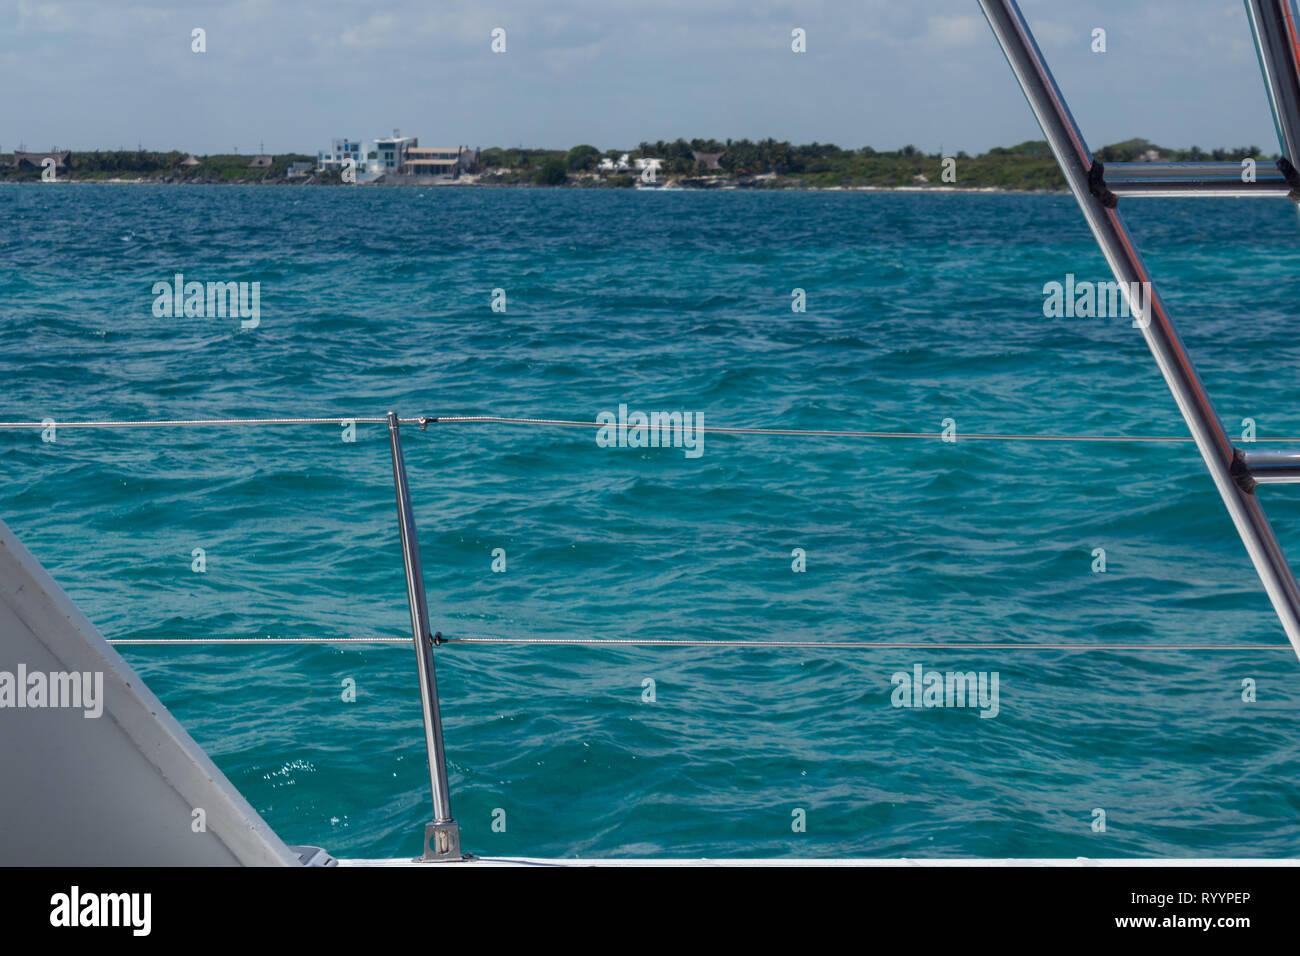 sailboat handrail in the caribbean. metal handrail against crystal clear caribbean water - Stock Image